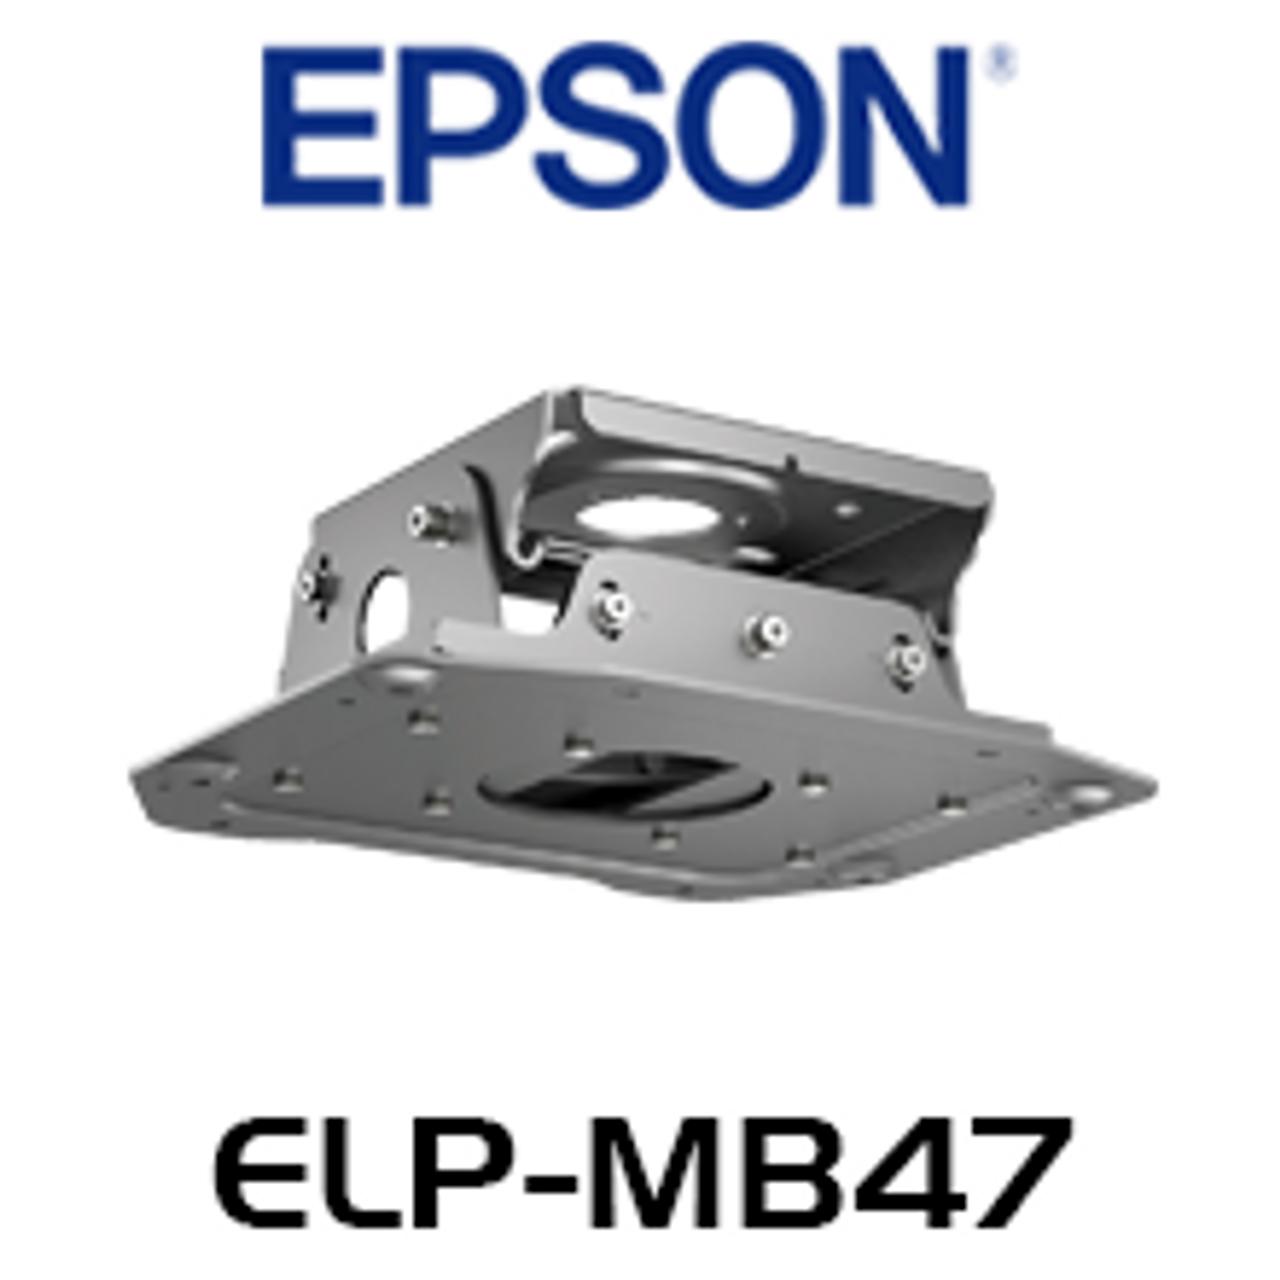 Epson ELPMB47 Low Profile Ceiling Mount For G7000 Series Projectors